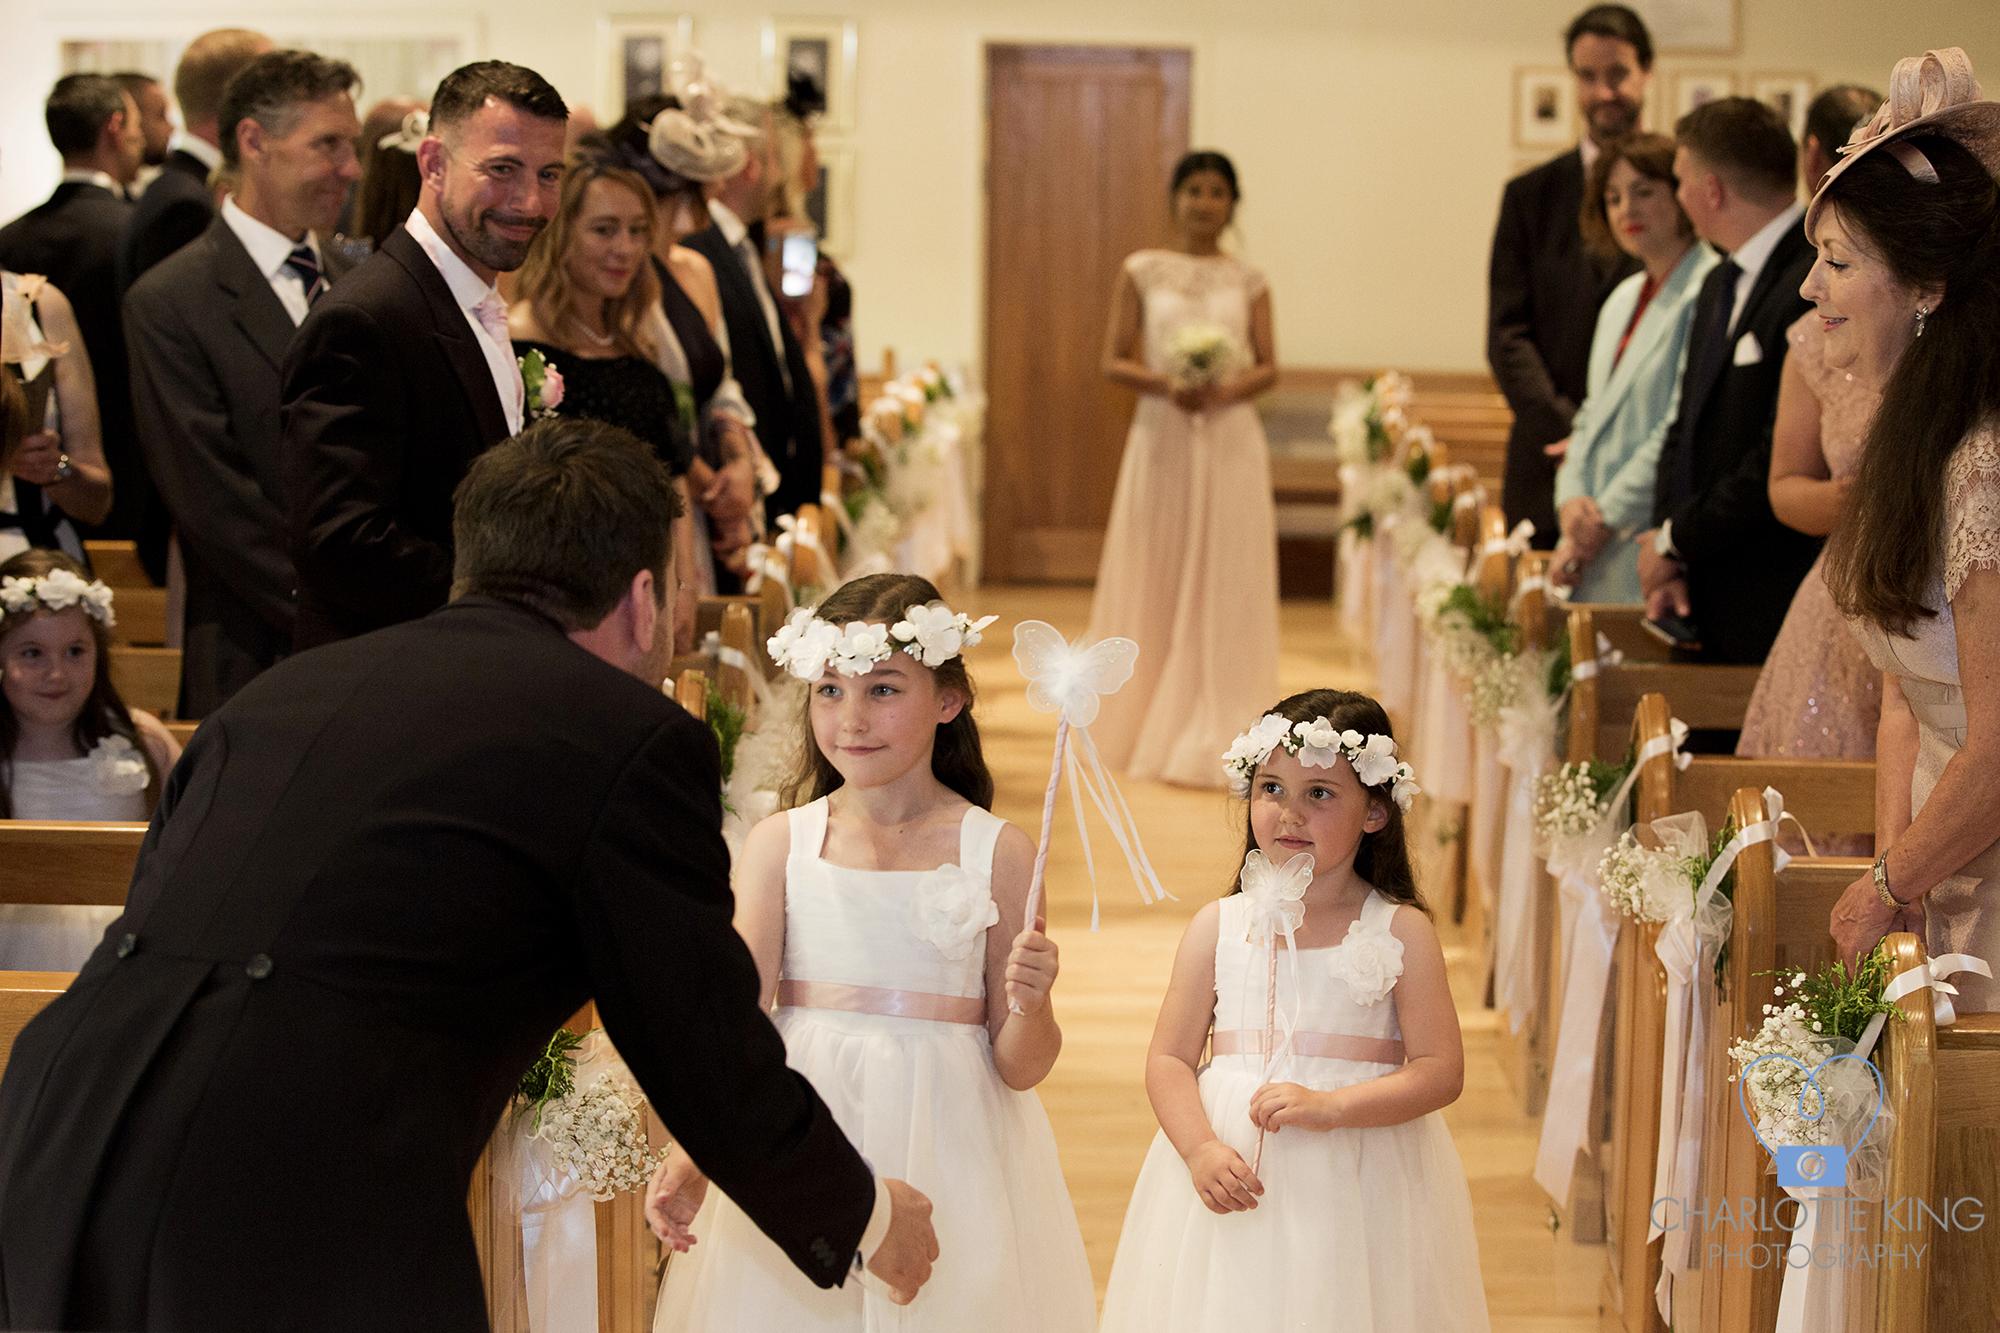 Woldingham-school-wedding-charlotte-king-photography (41)